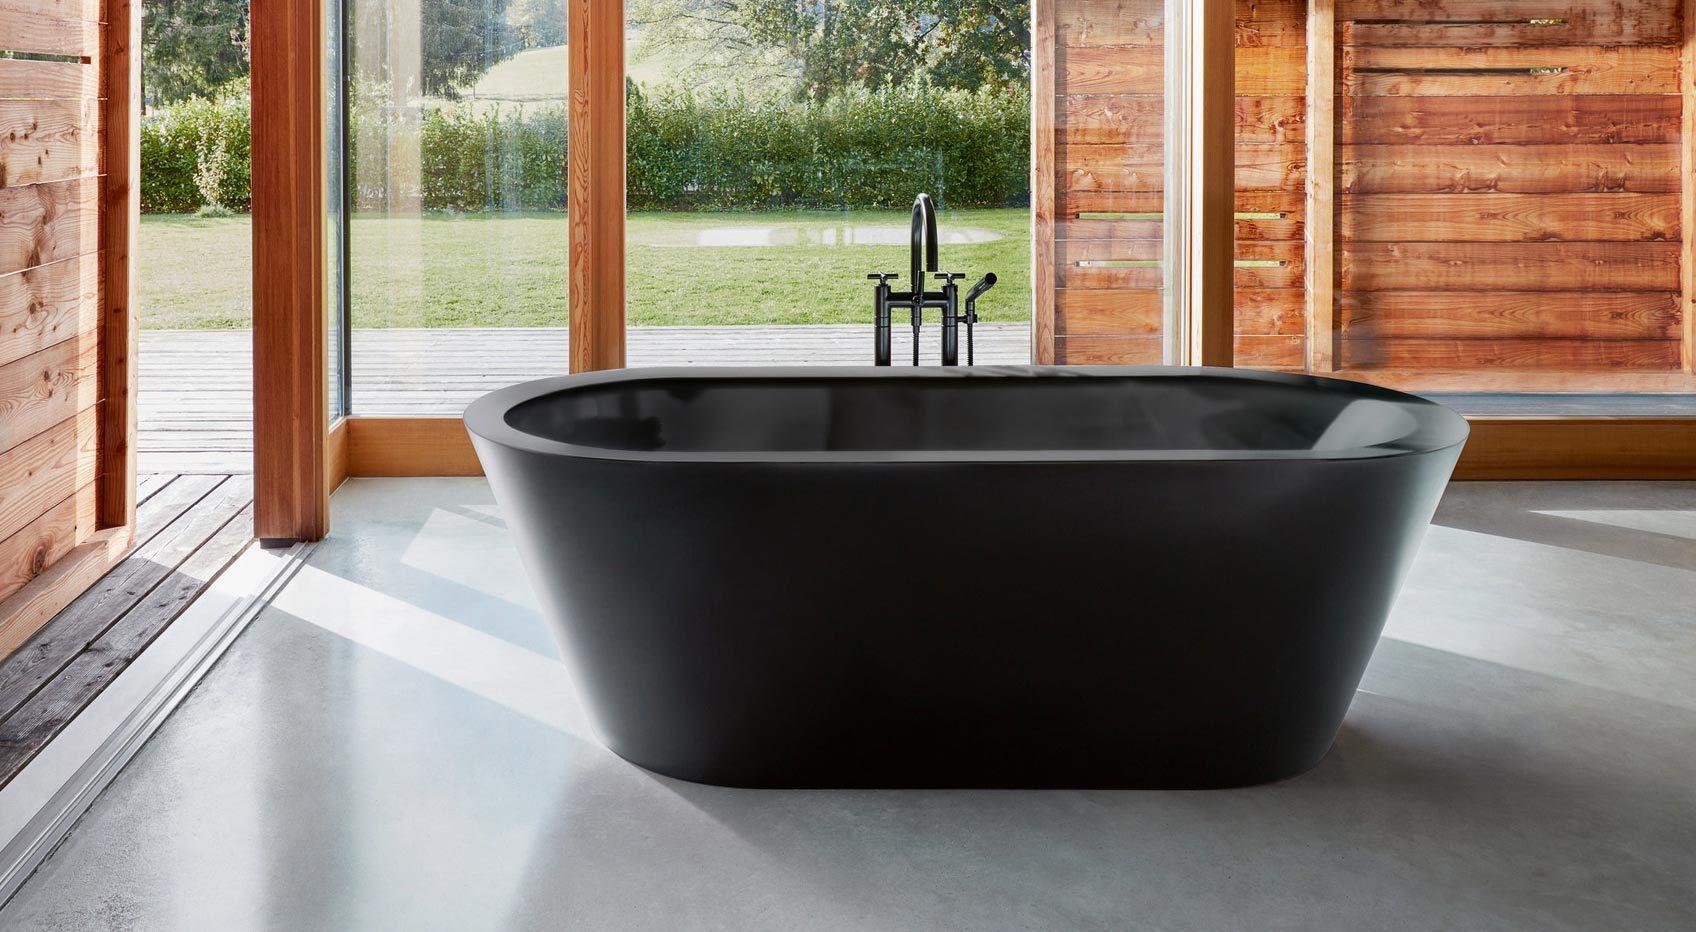 Freistehende Badewanne BetteStarlet in der Farbe Ebony.